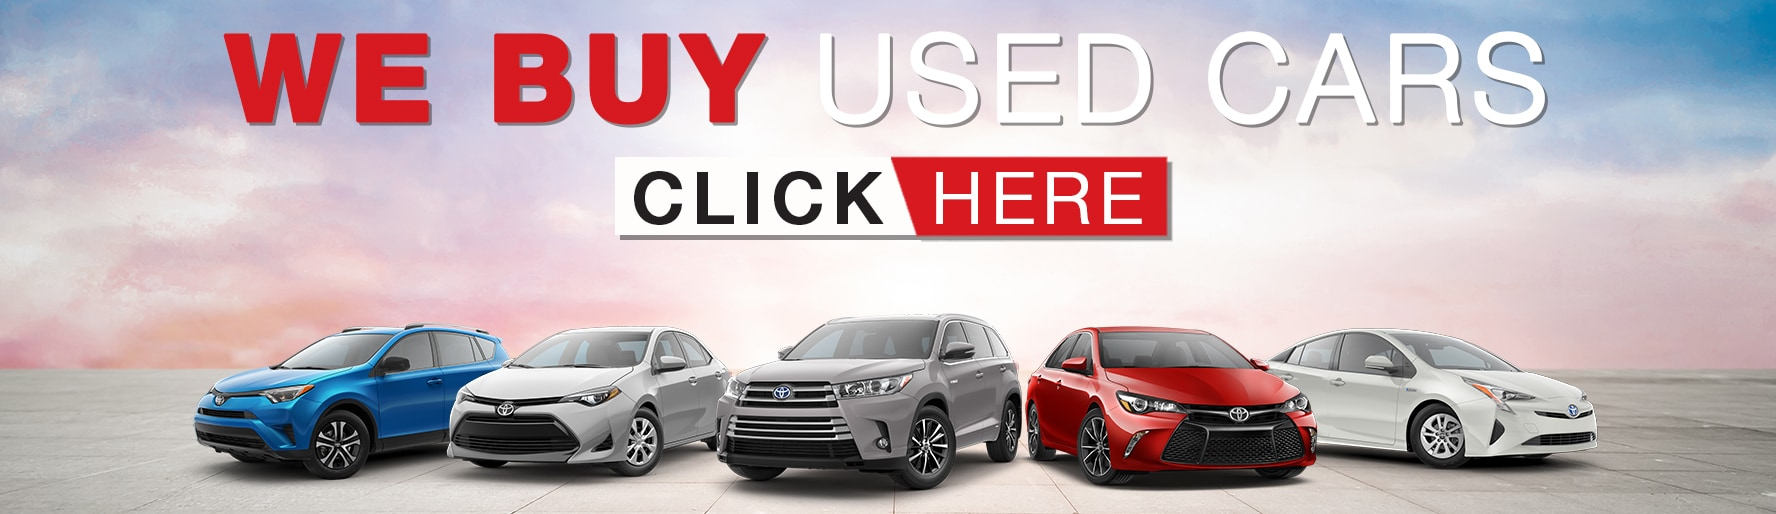 Toyota Carlsbad CA | New Toyota Dealer Serving Carlsbad, San Diego ...